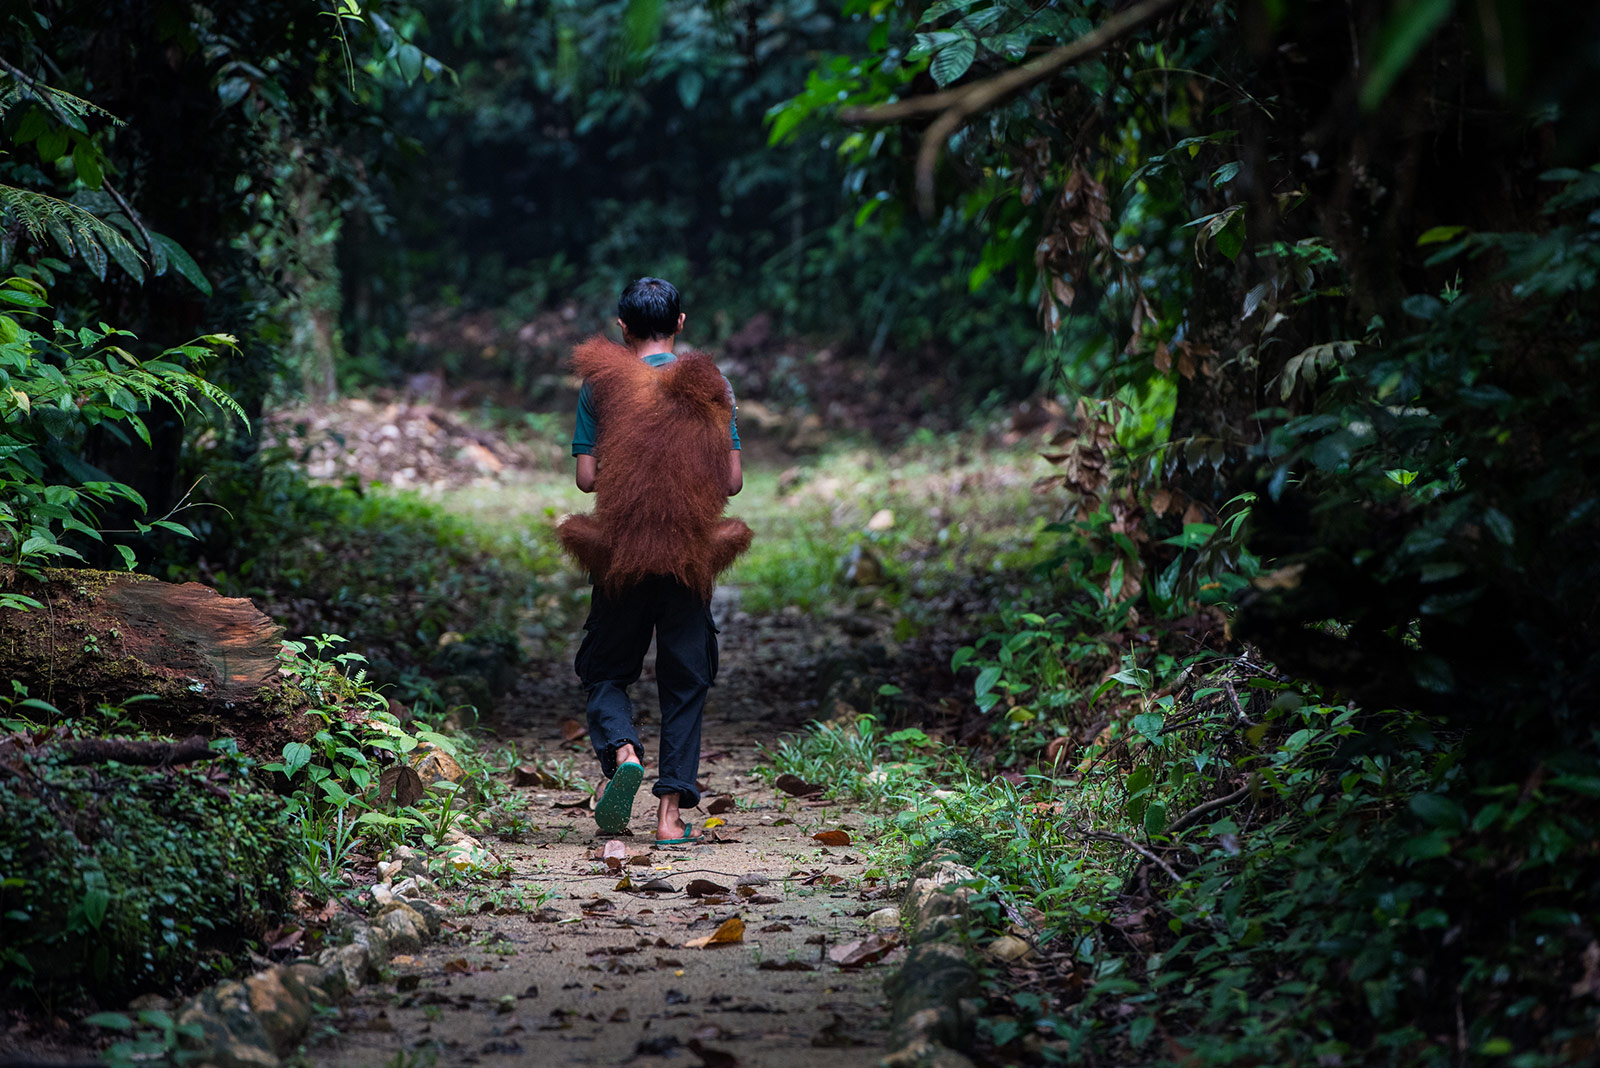 Home: The Photographs - Shared Home, Bukit Tigapuluh National Park Sumatra, Indonesia